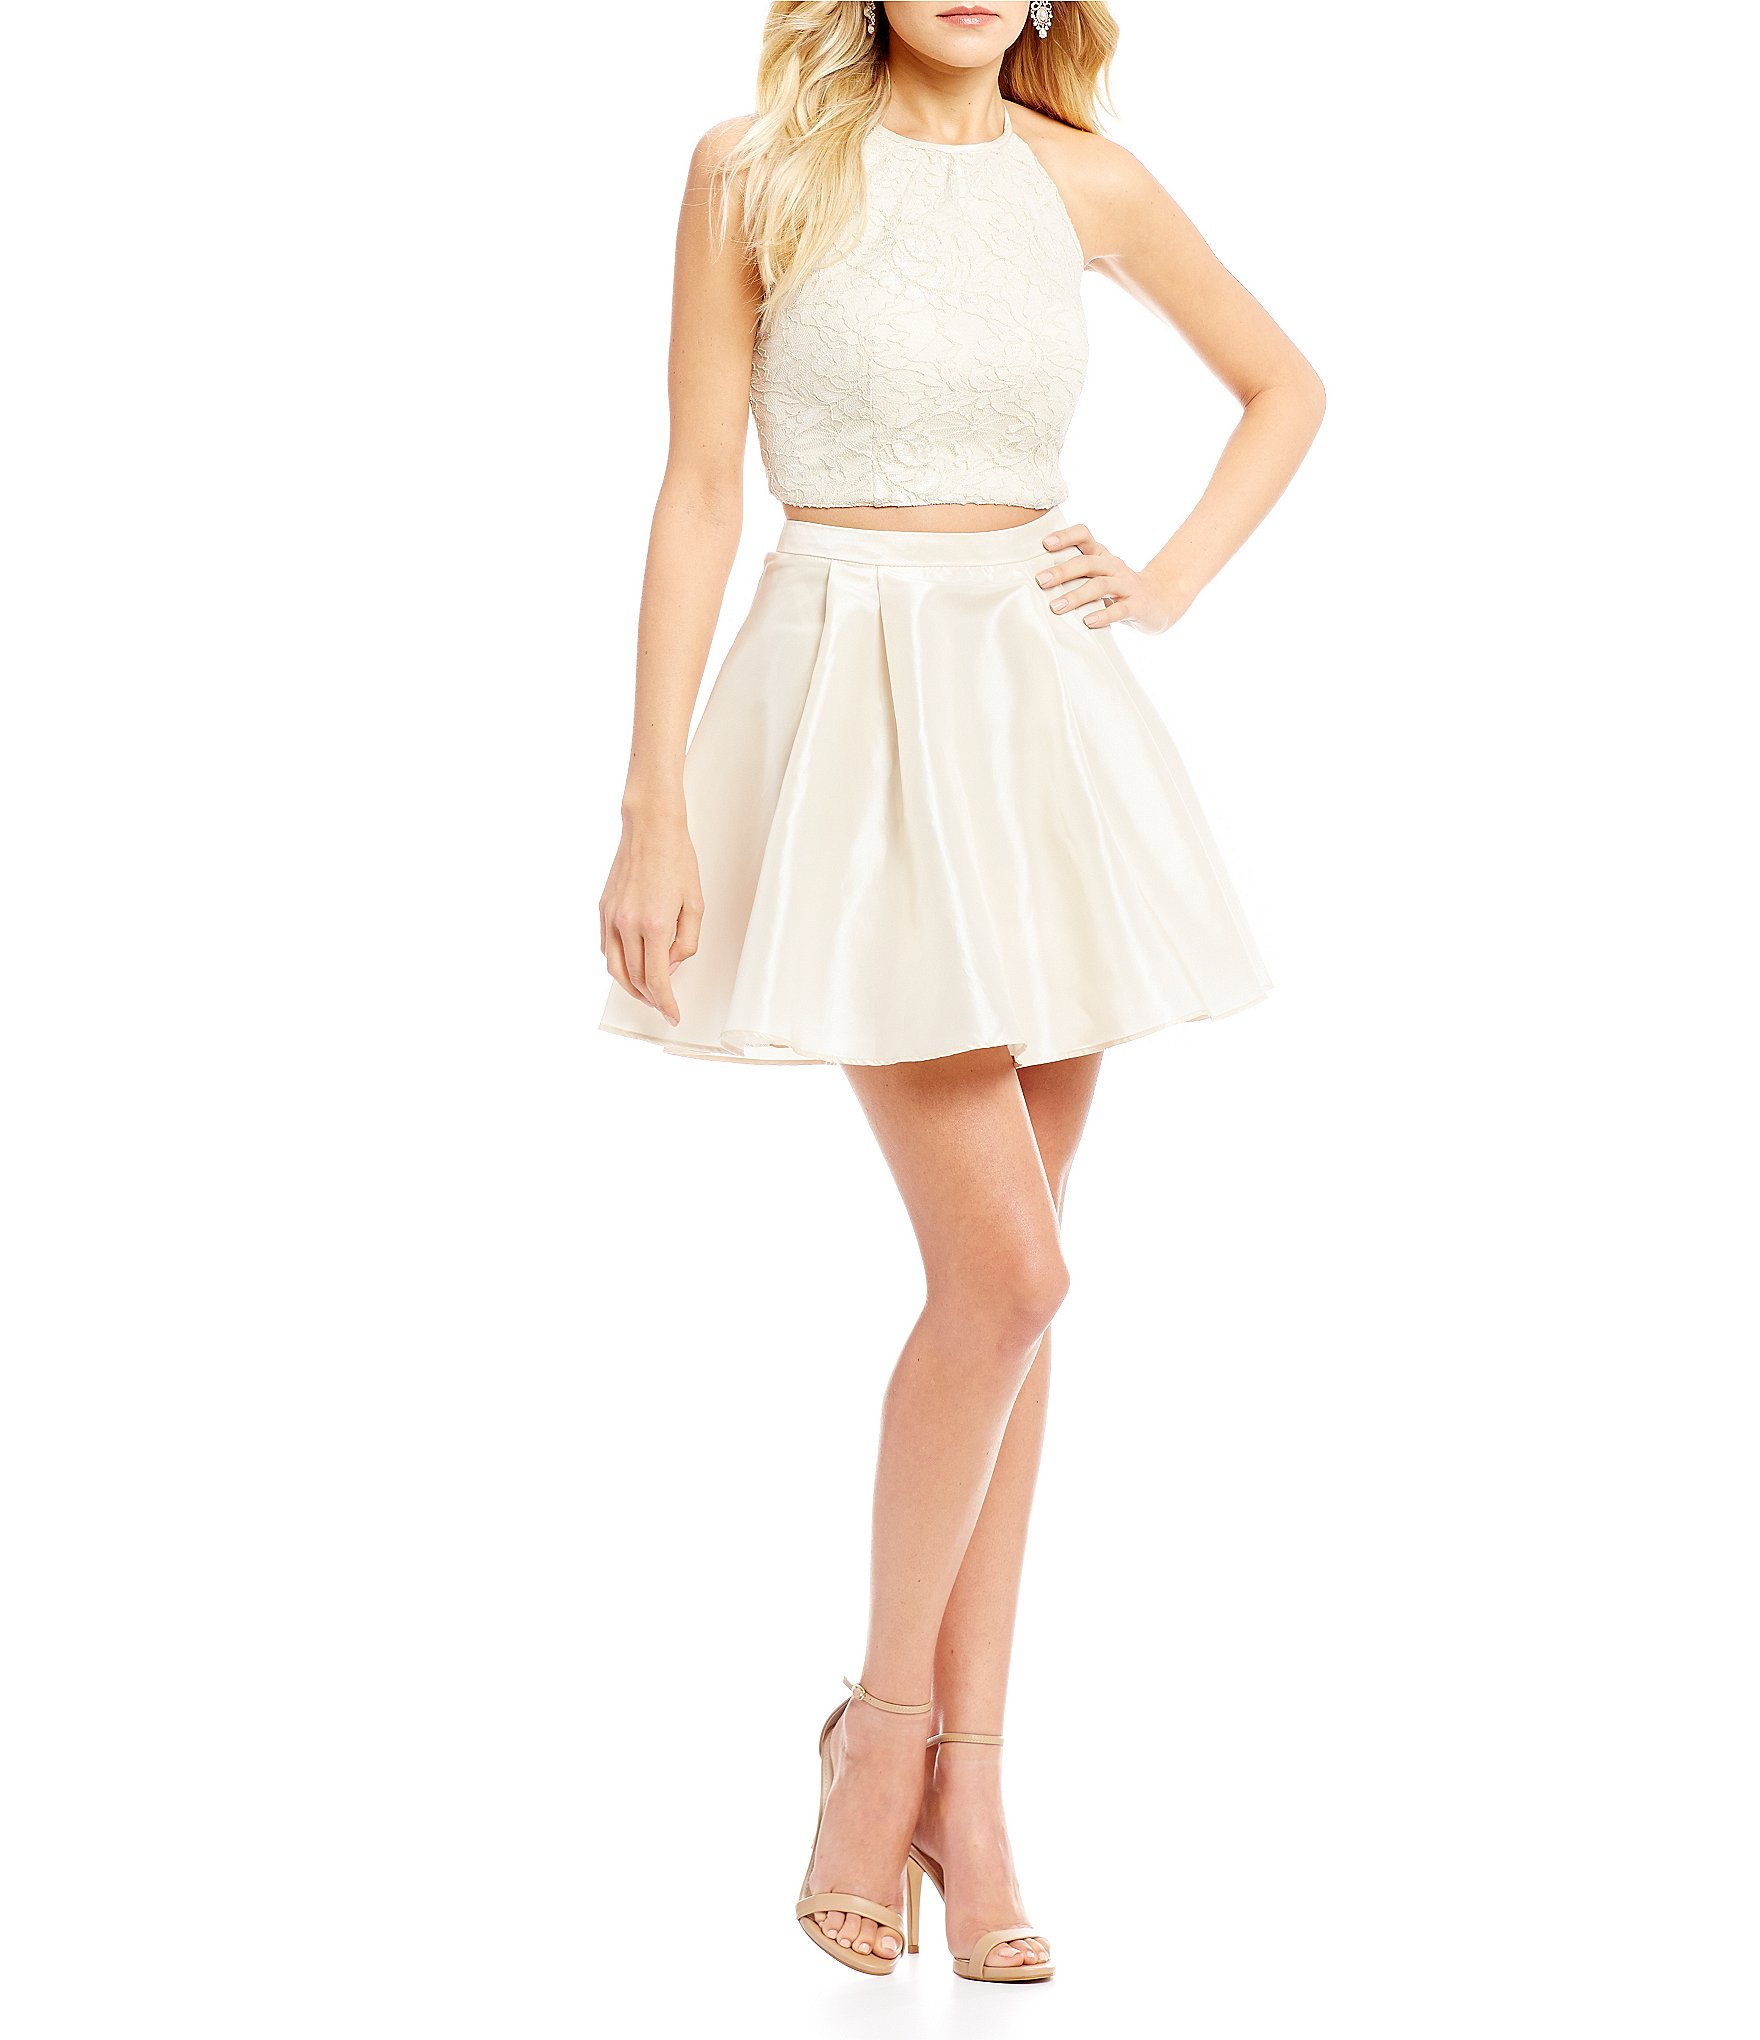 B. Darlin Two-Piece Foil Lace Top Party Dress | Dillards